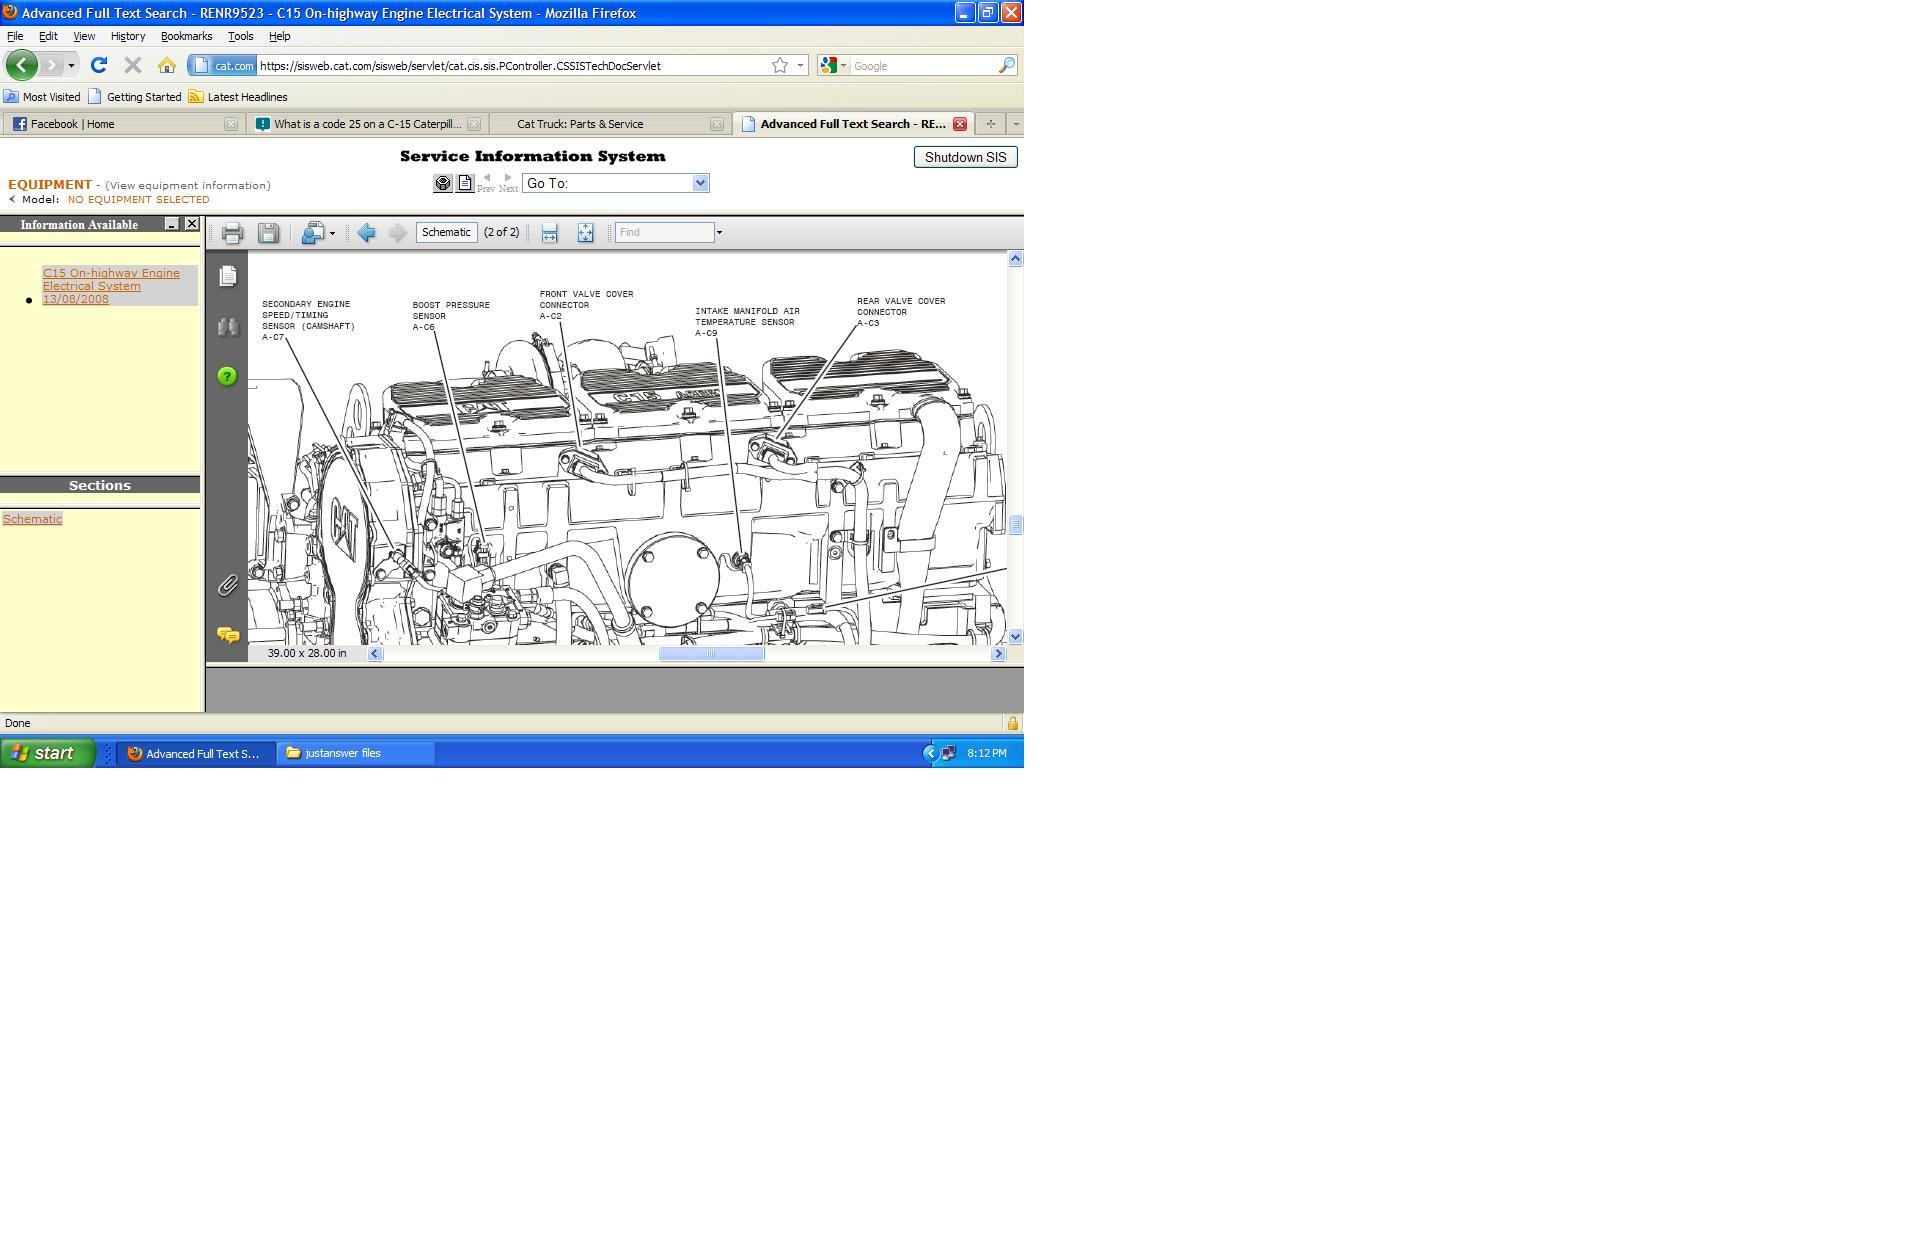 caterpillar c15 wiring diagram wiring schematics and diagrams caterpillar c15 acert wiring diagram schematics and diagrams